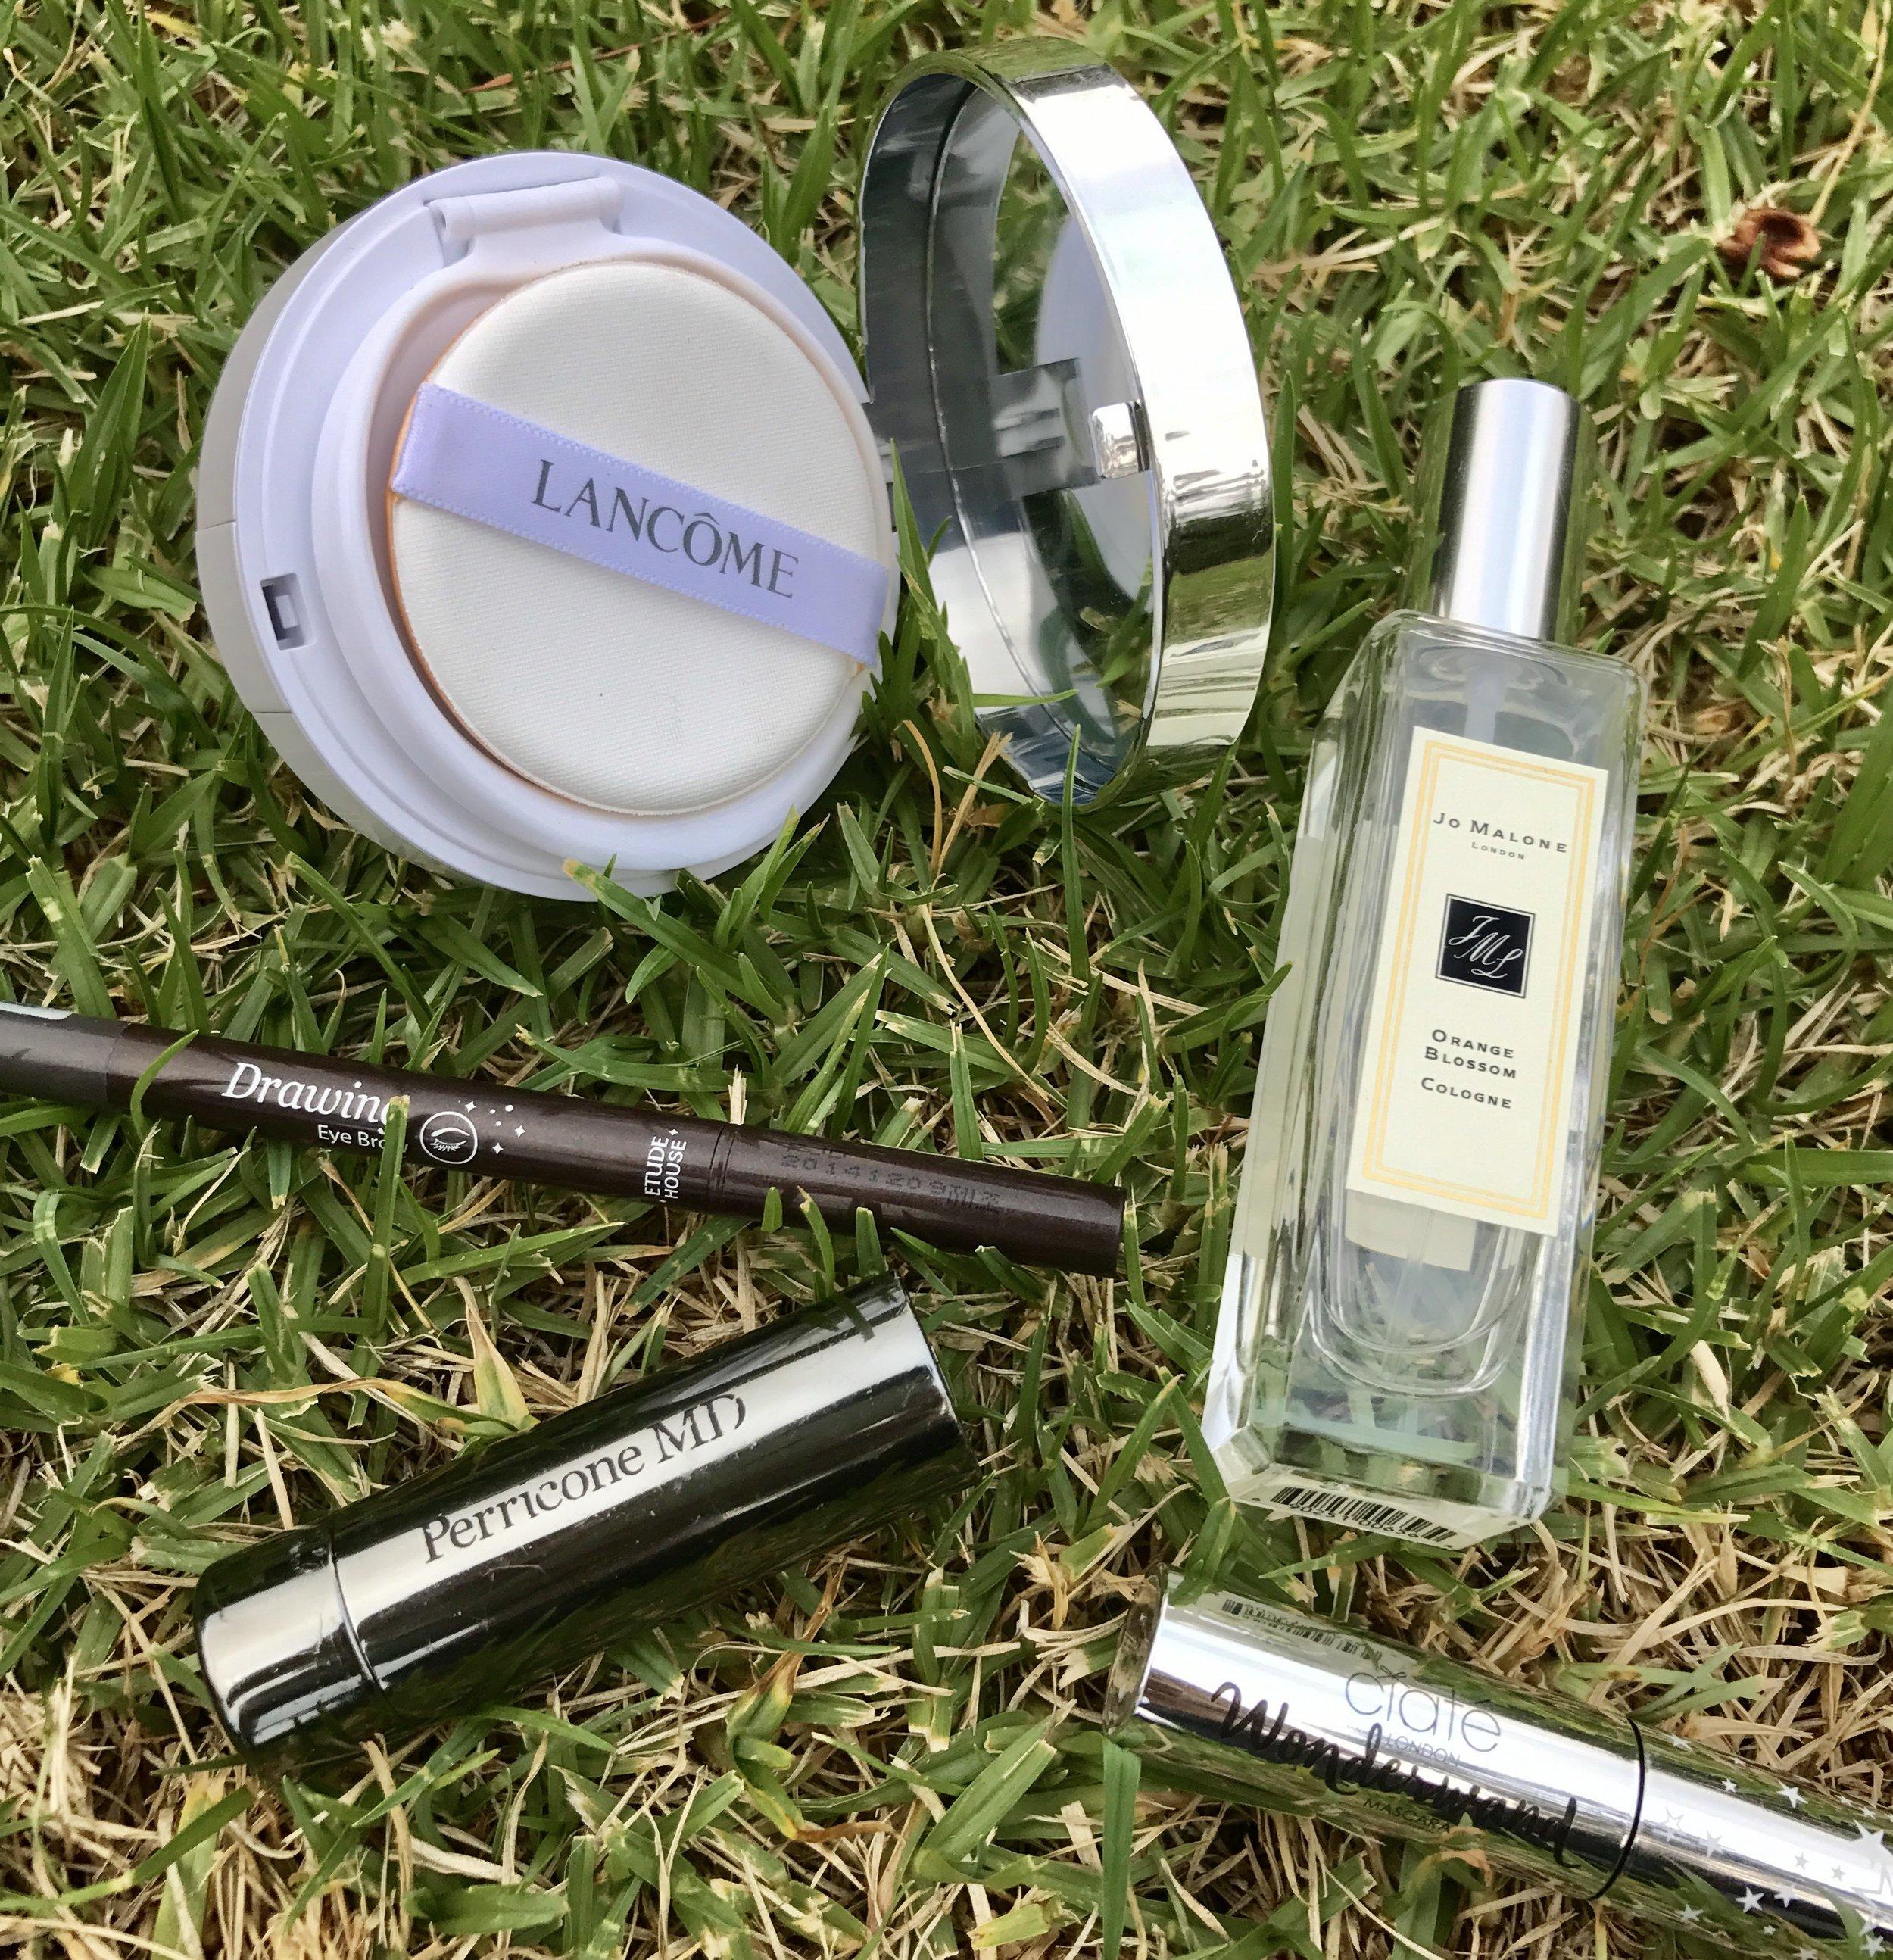 Products clockwise: Lancome Miracle Cushion 04, Jo Malone Orange Blossom, Ciate Wonderwand, Perricone No Lipstick Lipstick, Etude House Draw Eyebrow